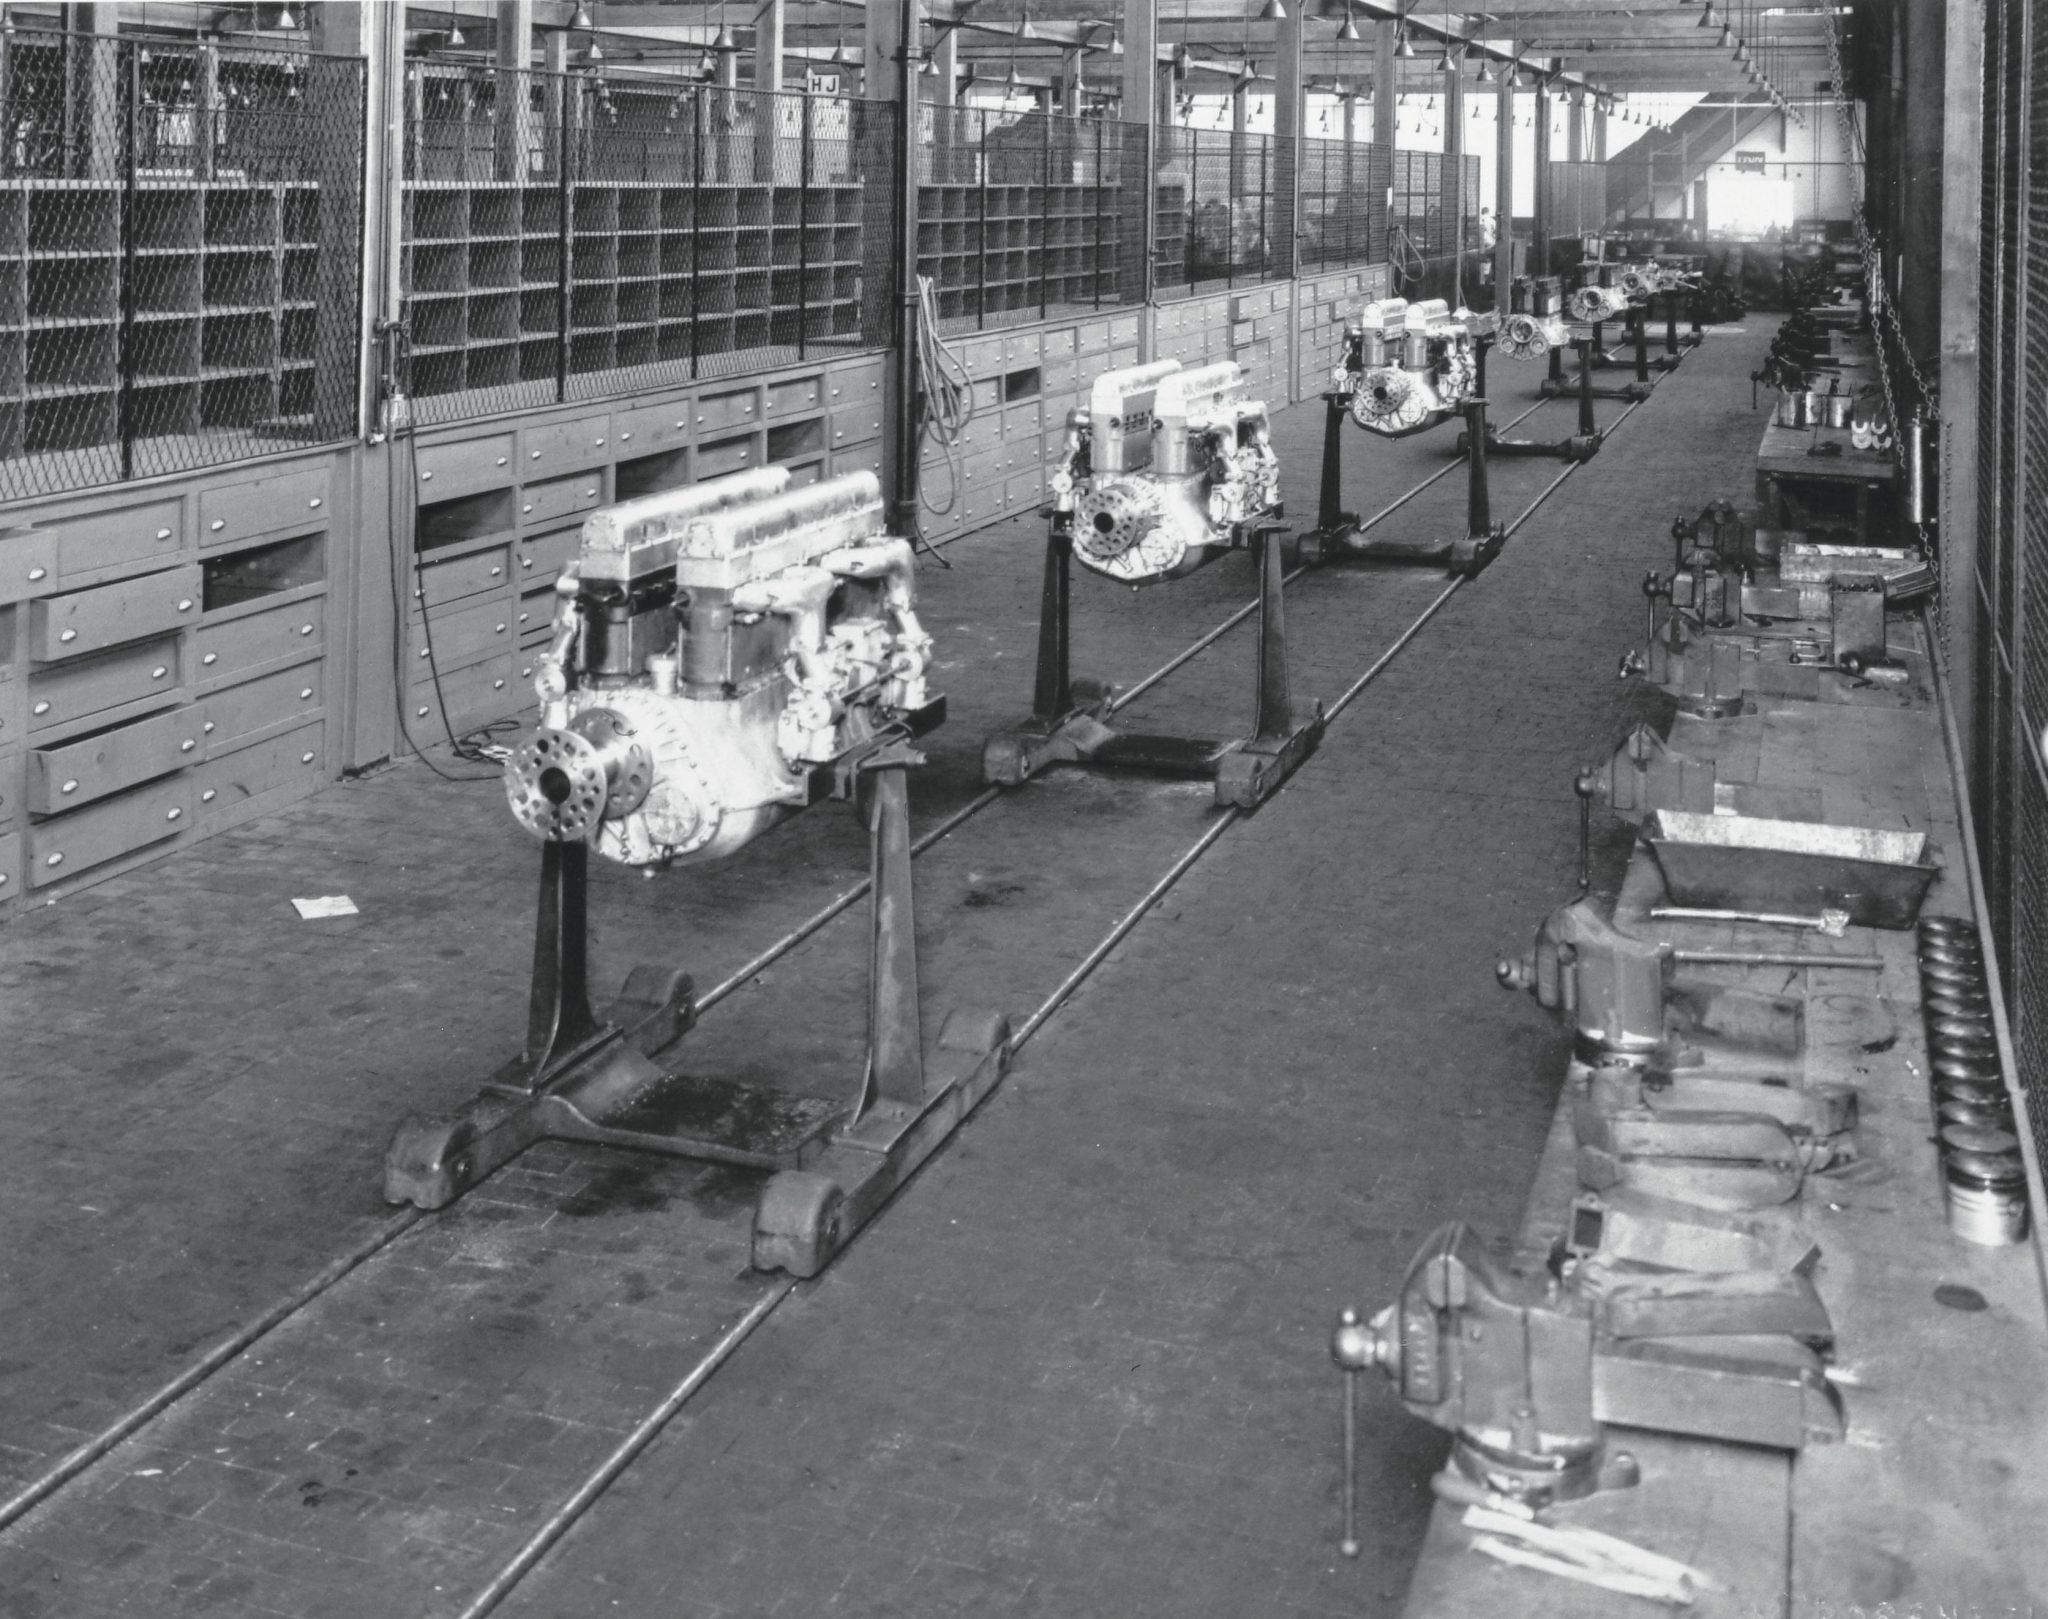 Bugatti U-16 aircraft engine production line